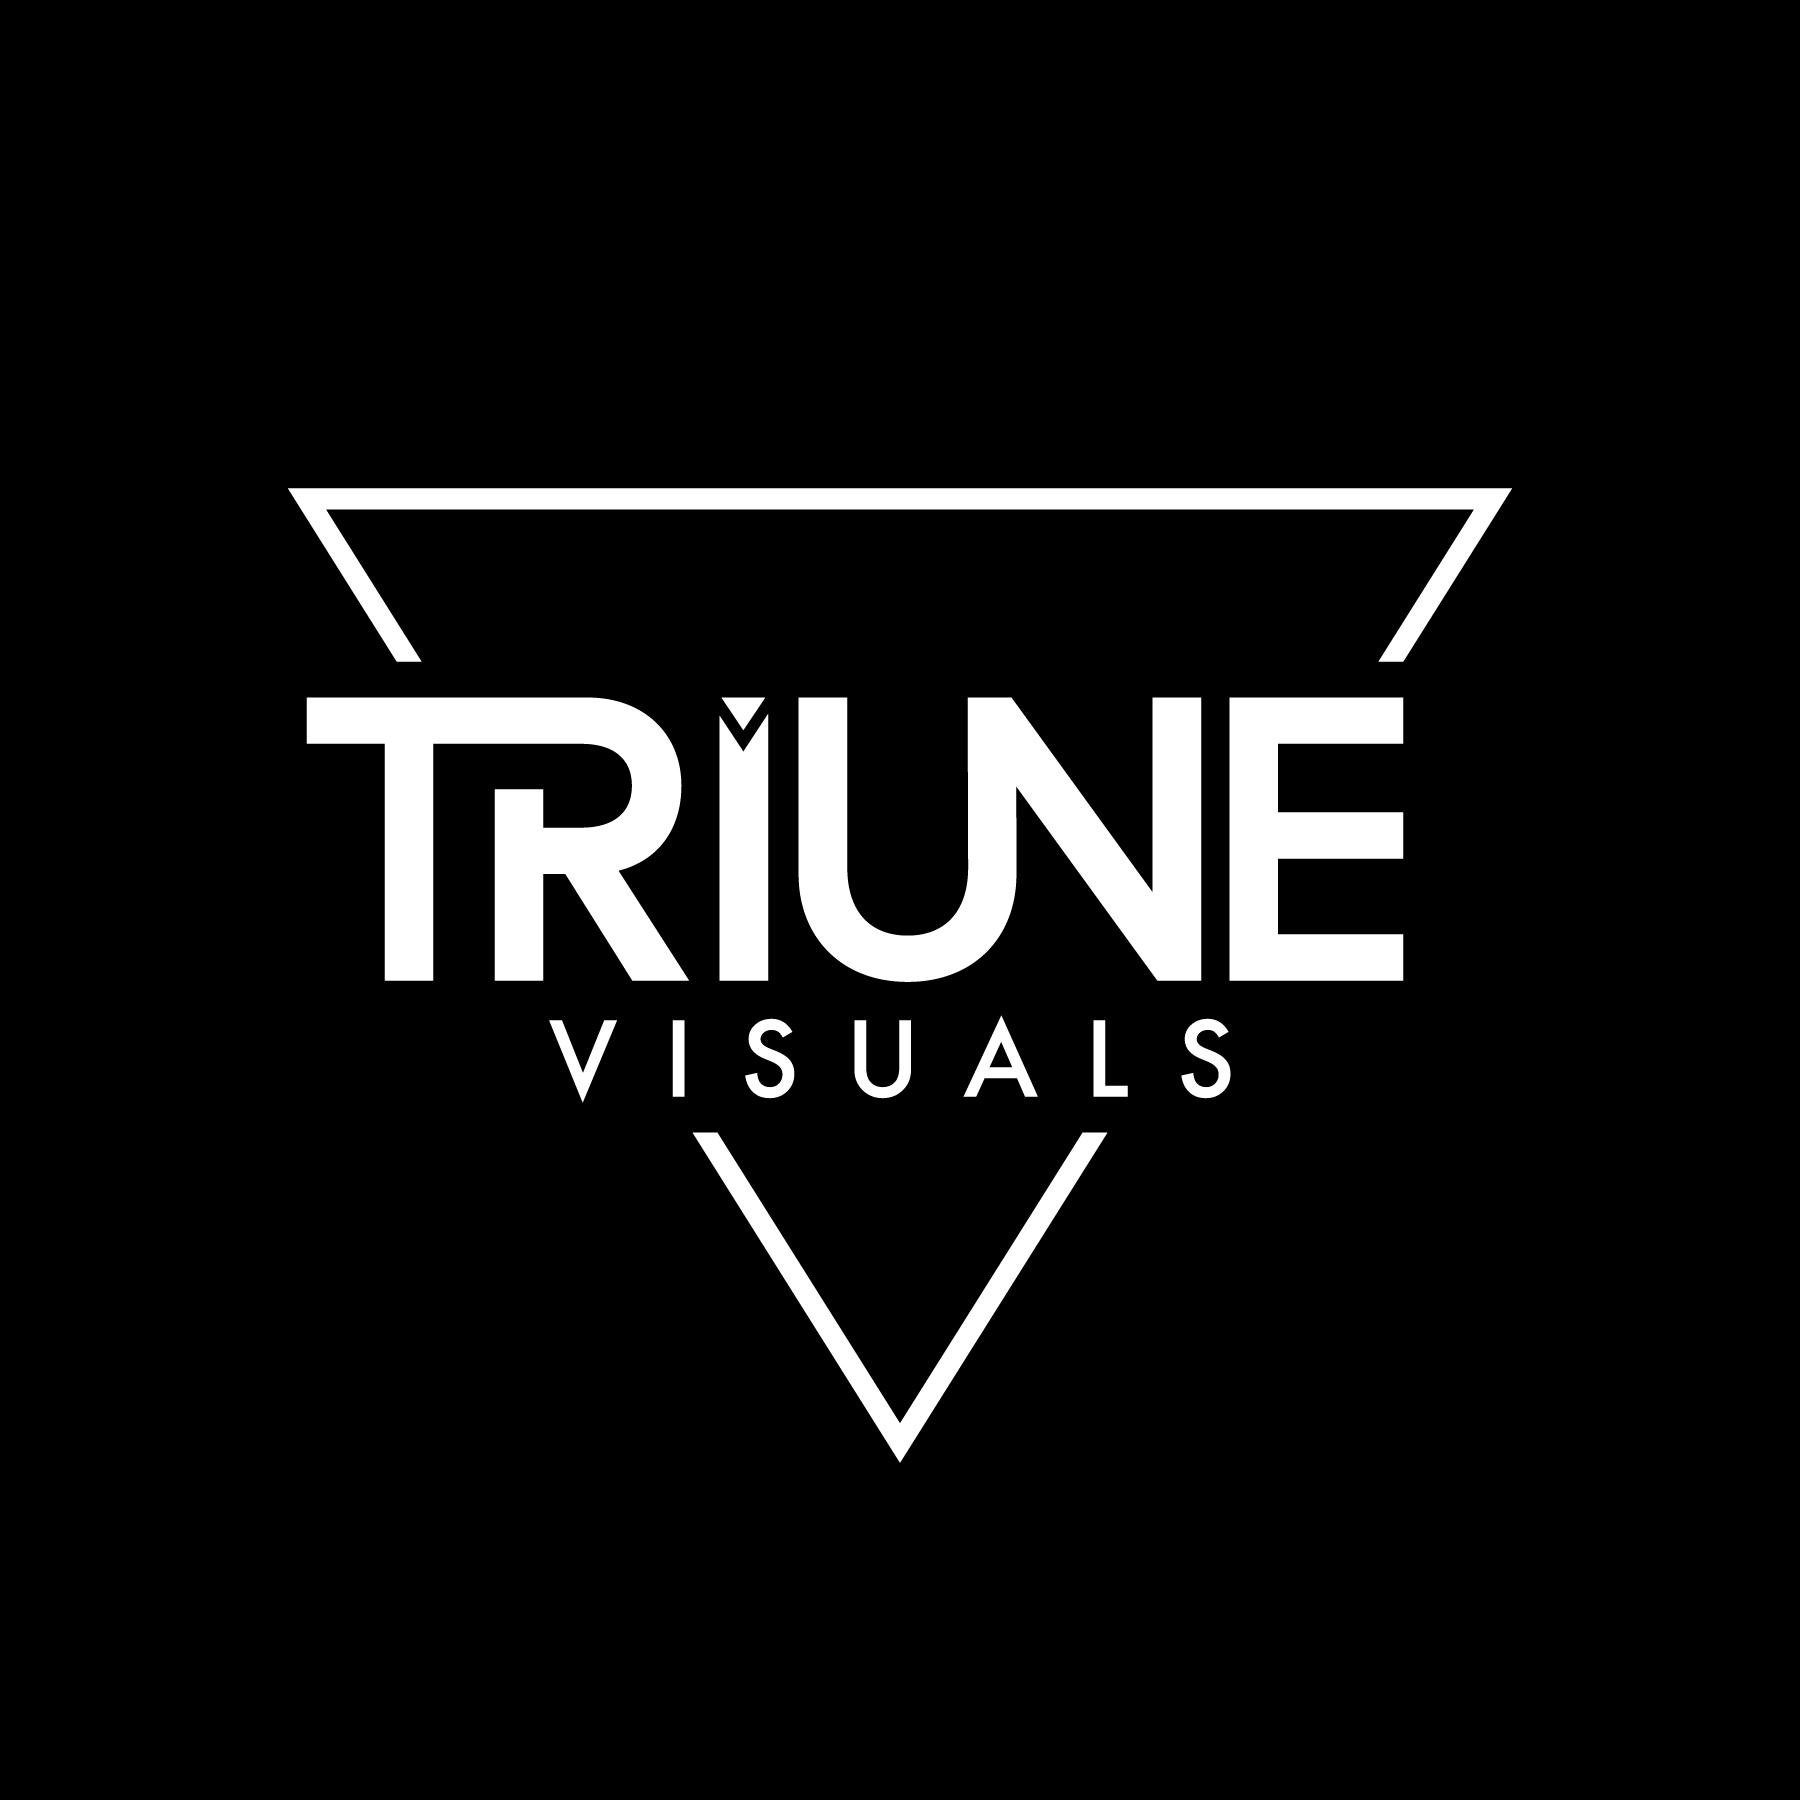 Triune_Logo-01.jpg